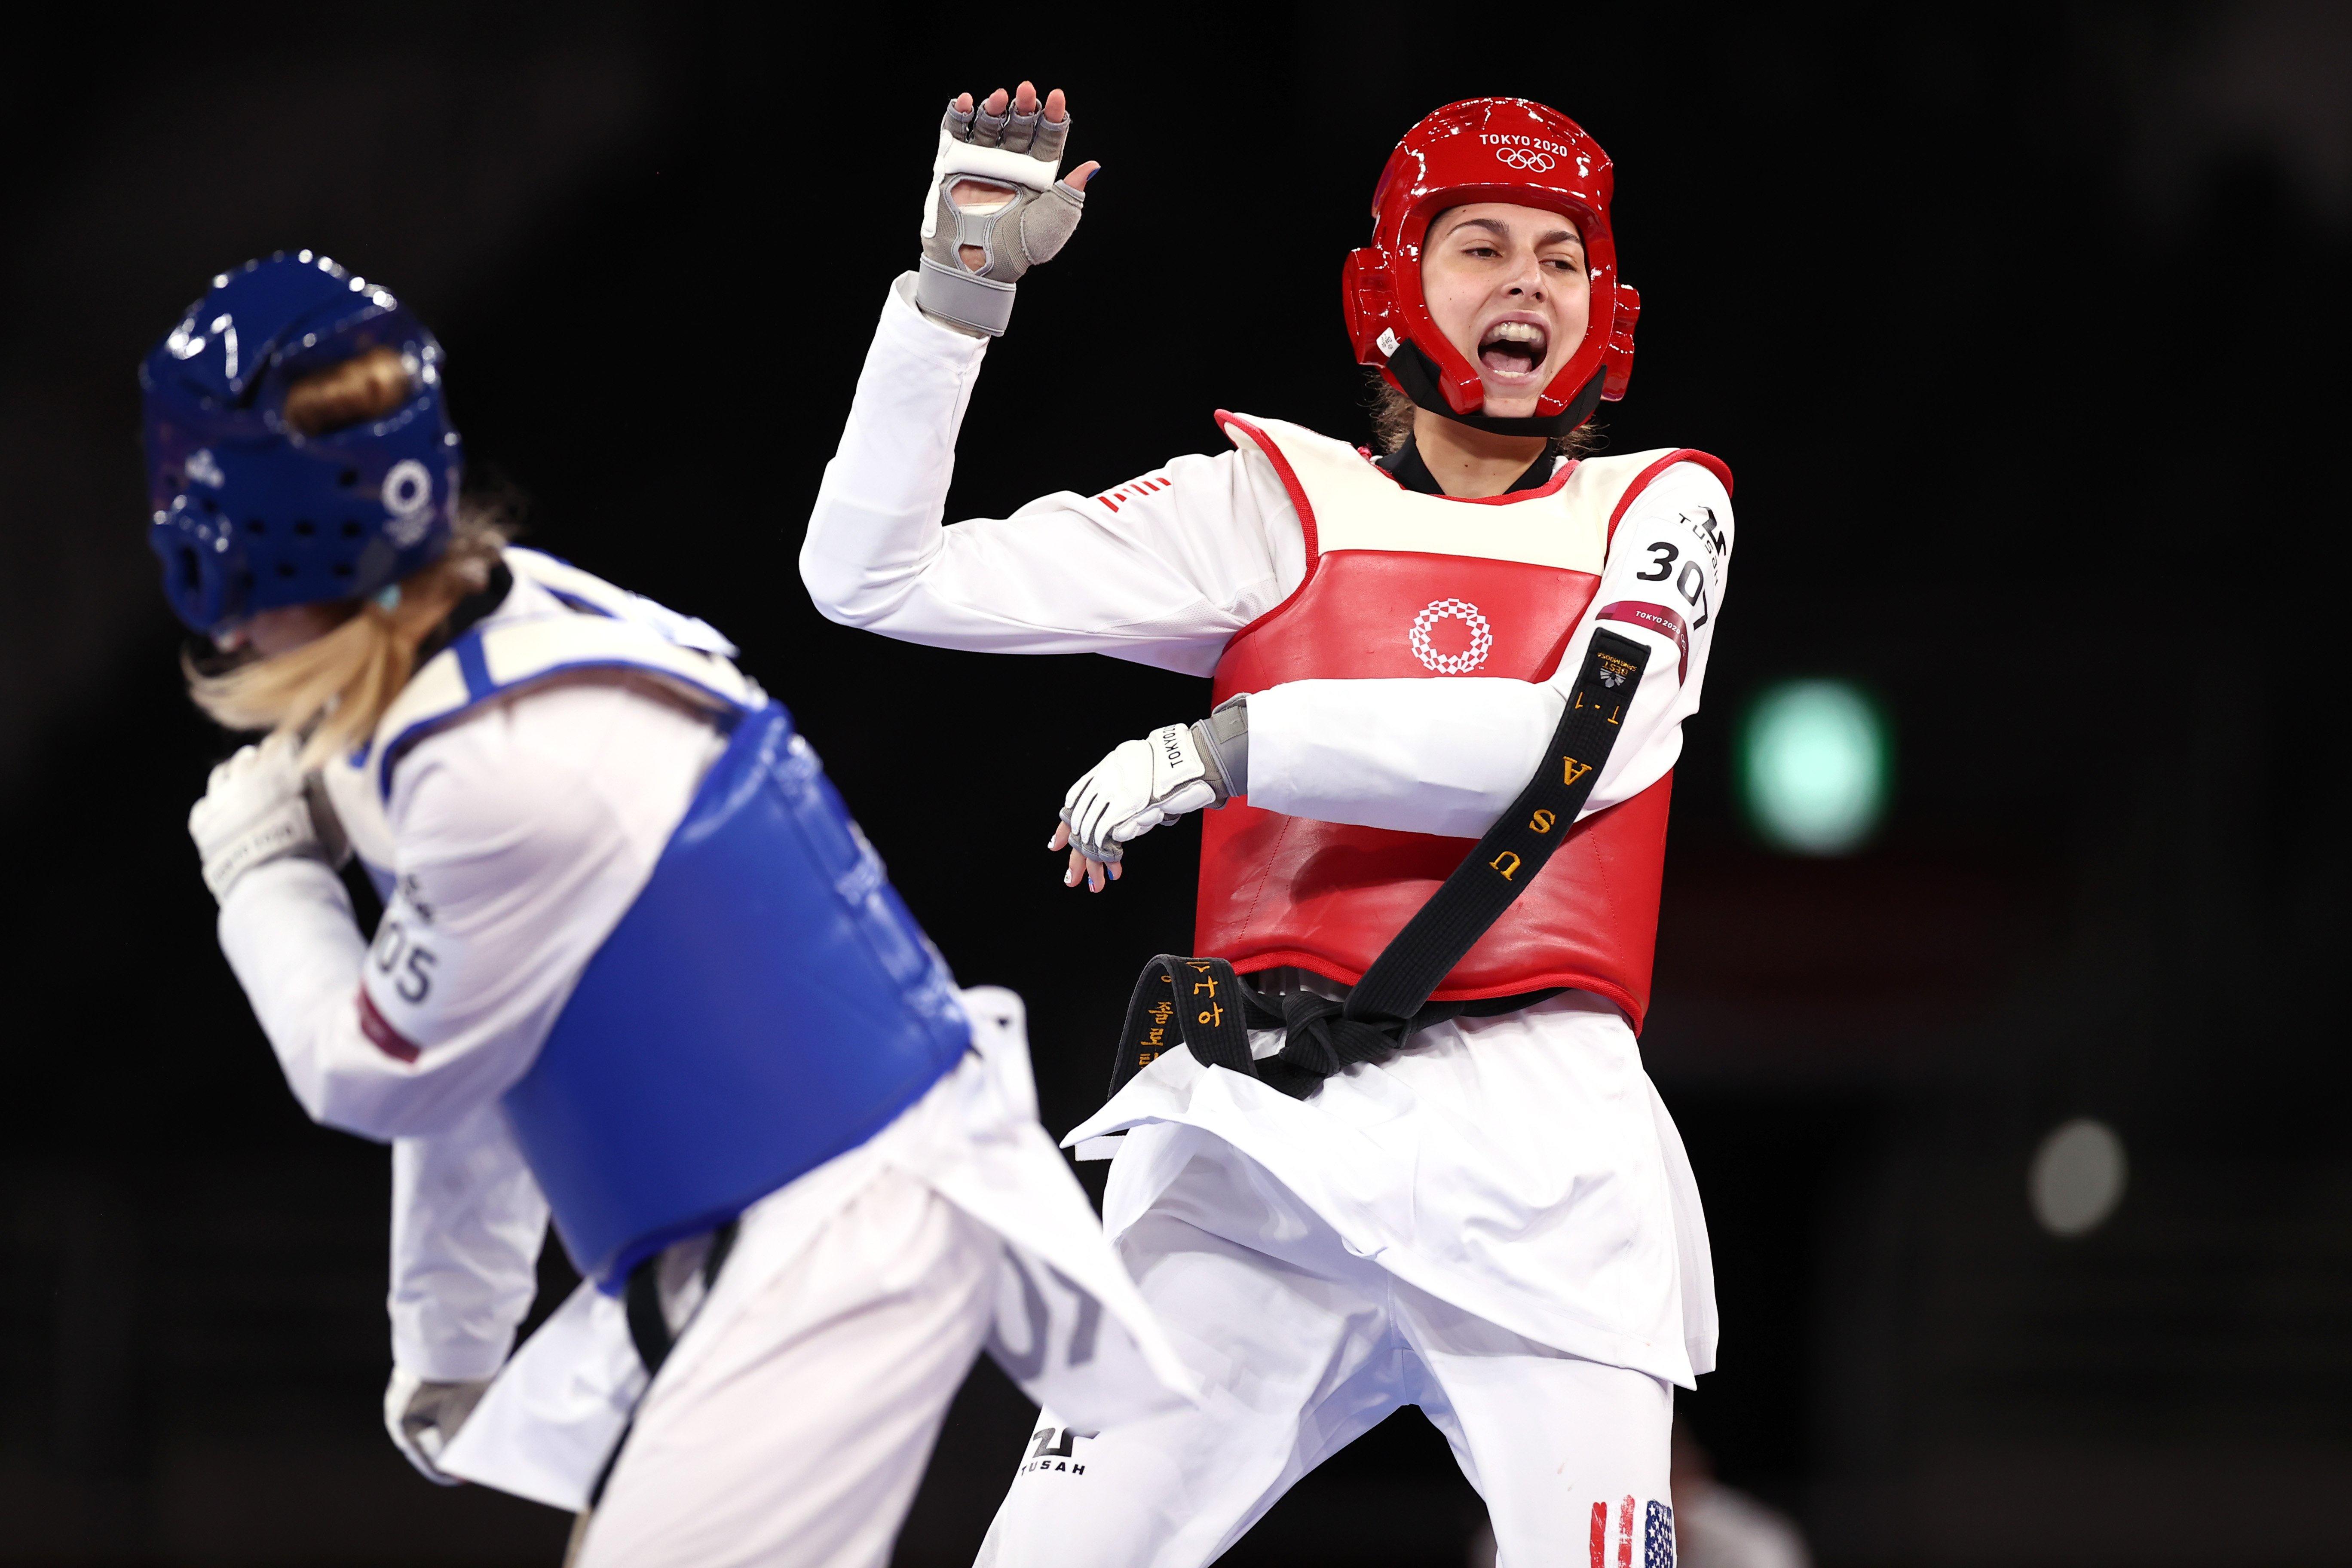 USA's Anastasija Zolotic wins historic first women's taekwondo gold medal